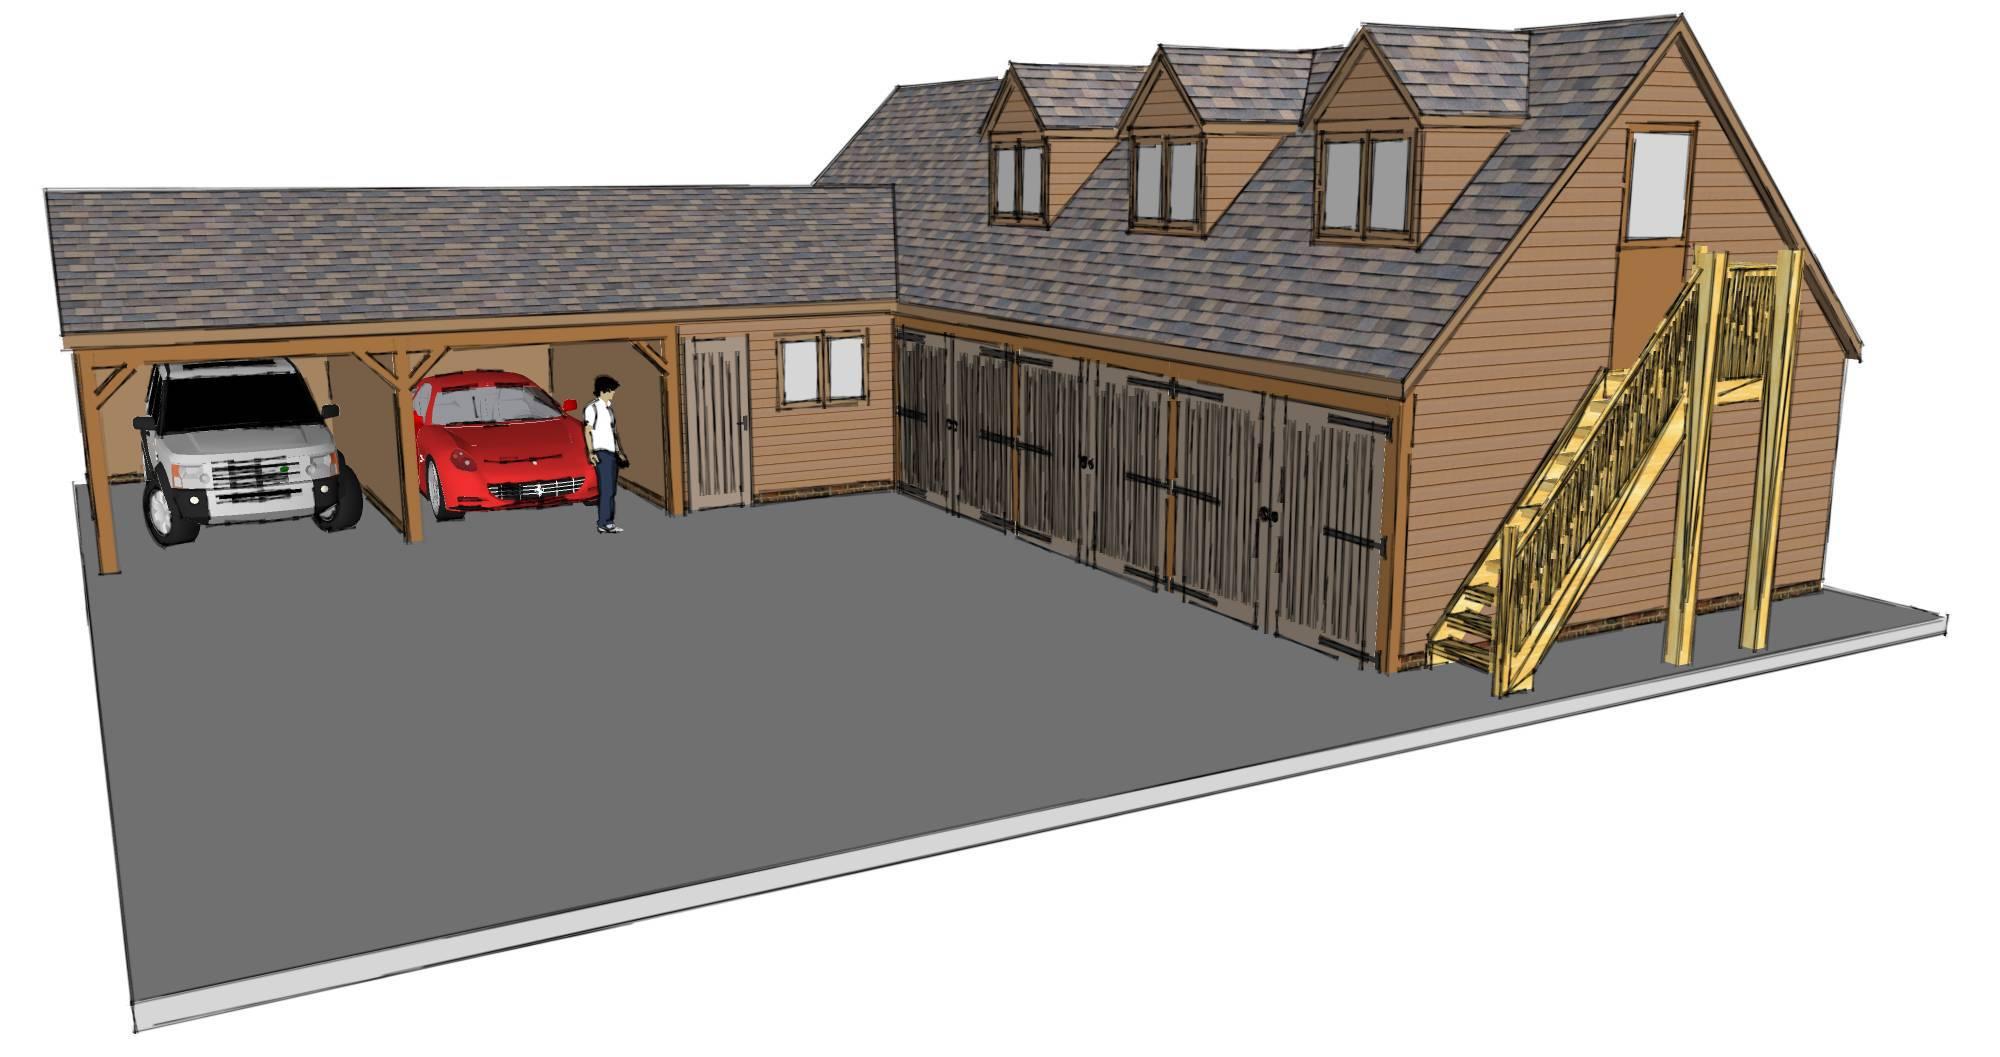 L-shaped House Plans 3 Car Garage